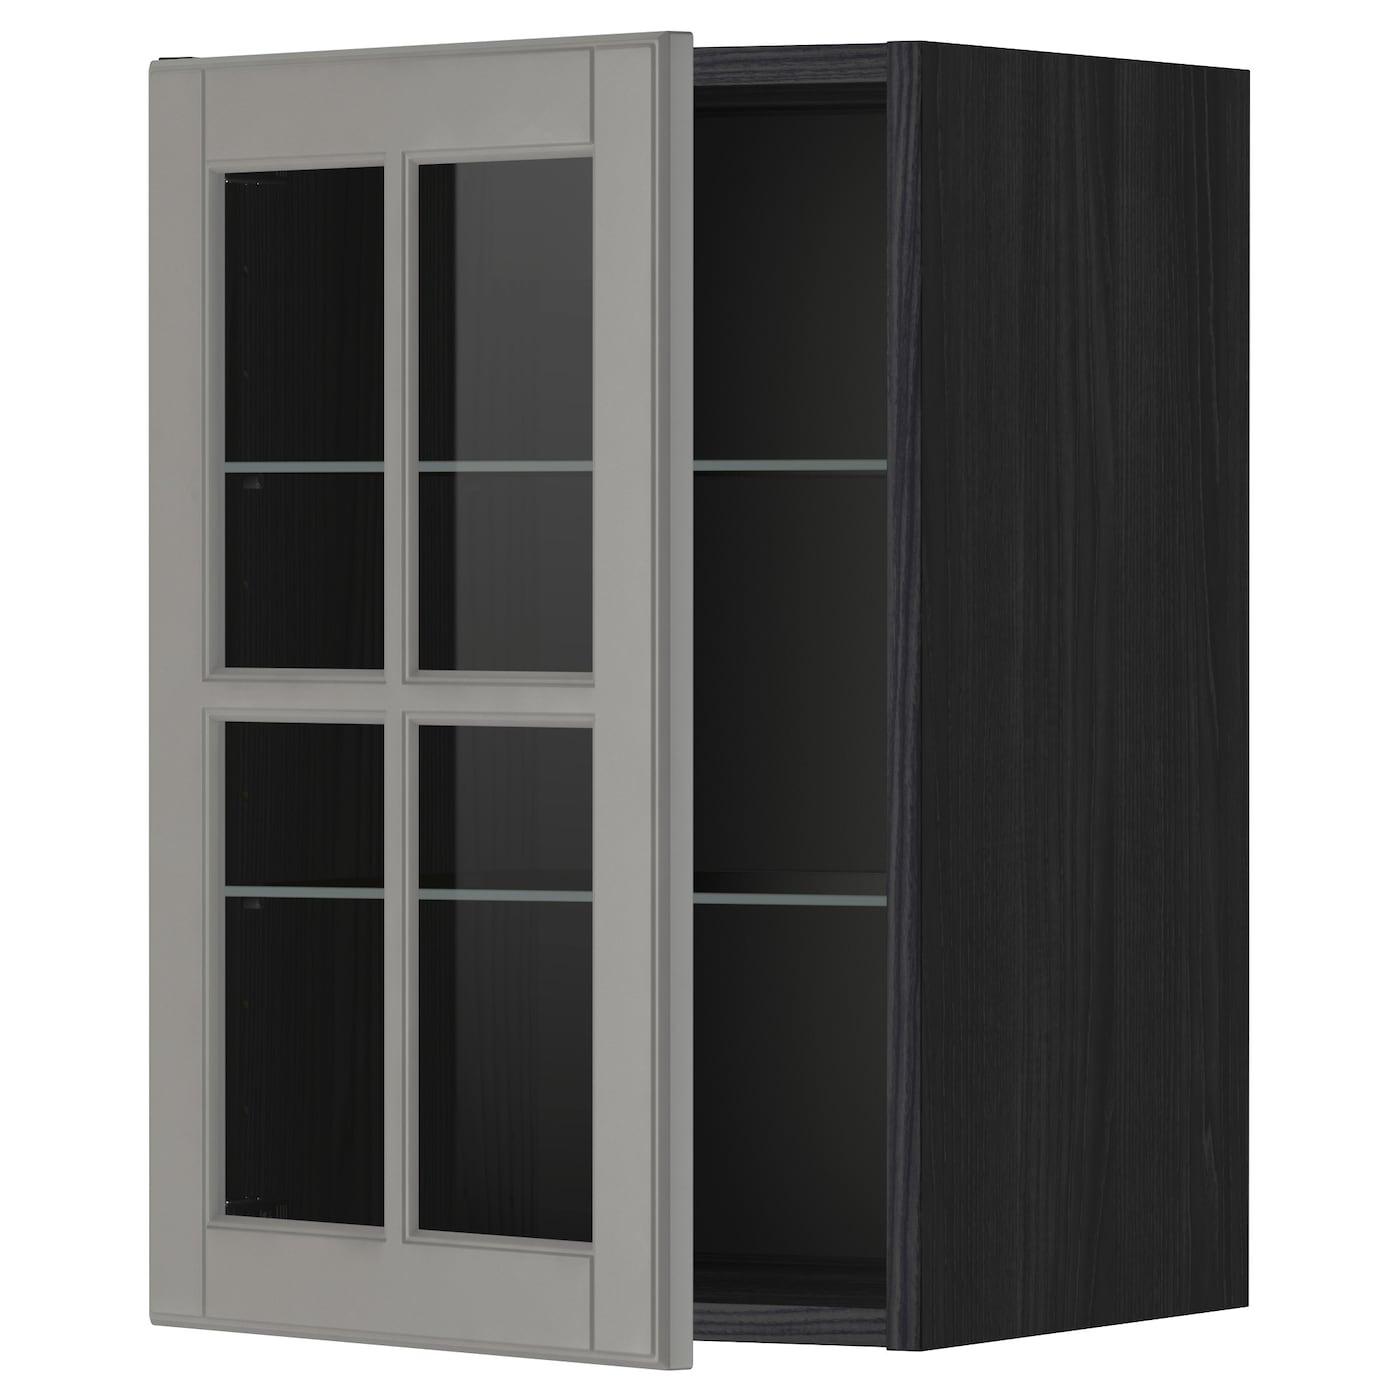 Dark Kitchen Cabinets With Glass Doors: METOD Wall Cabinet W Shelves/glass Door Black/bodbyn Grey